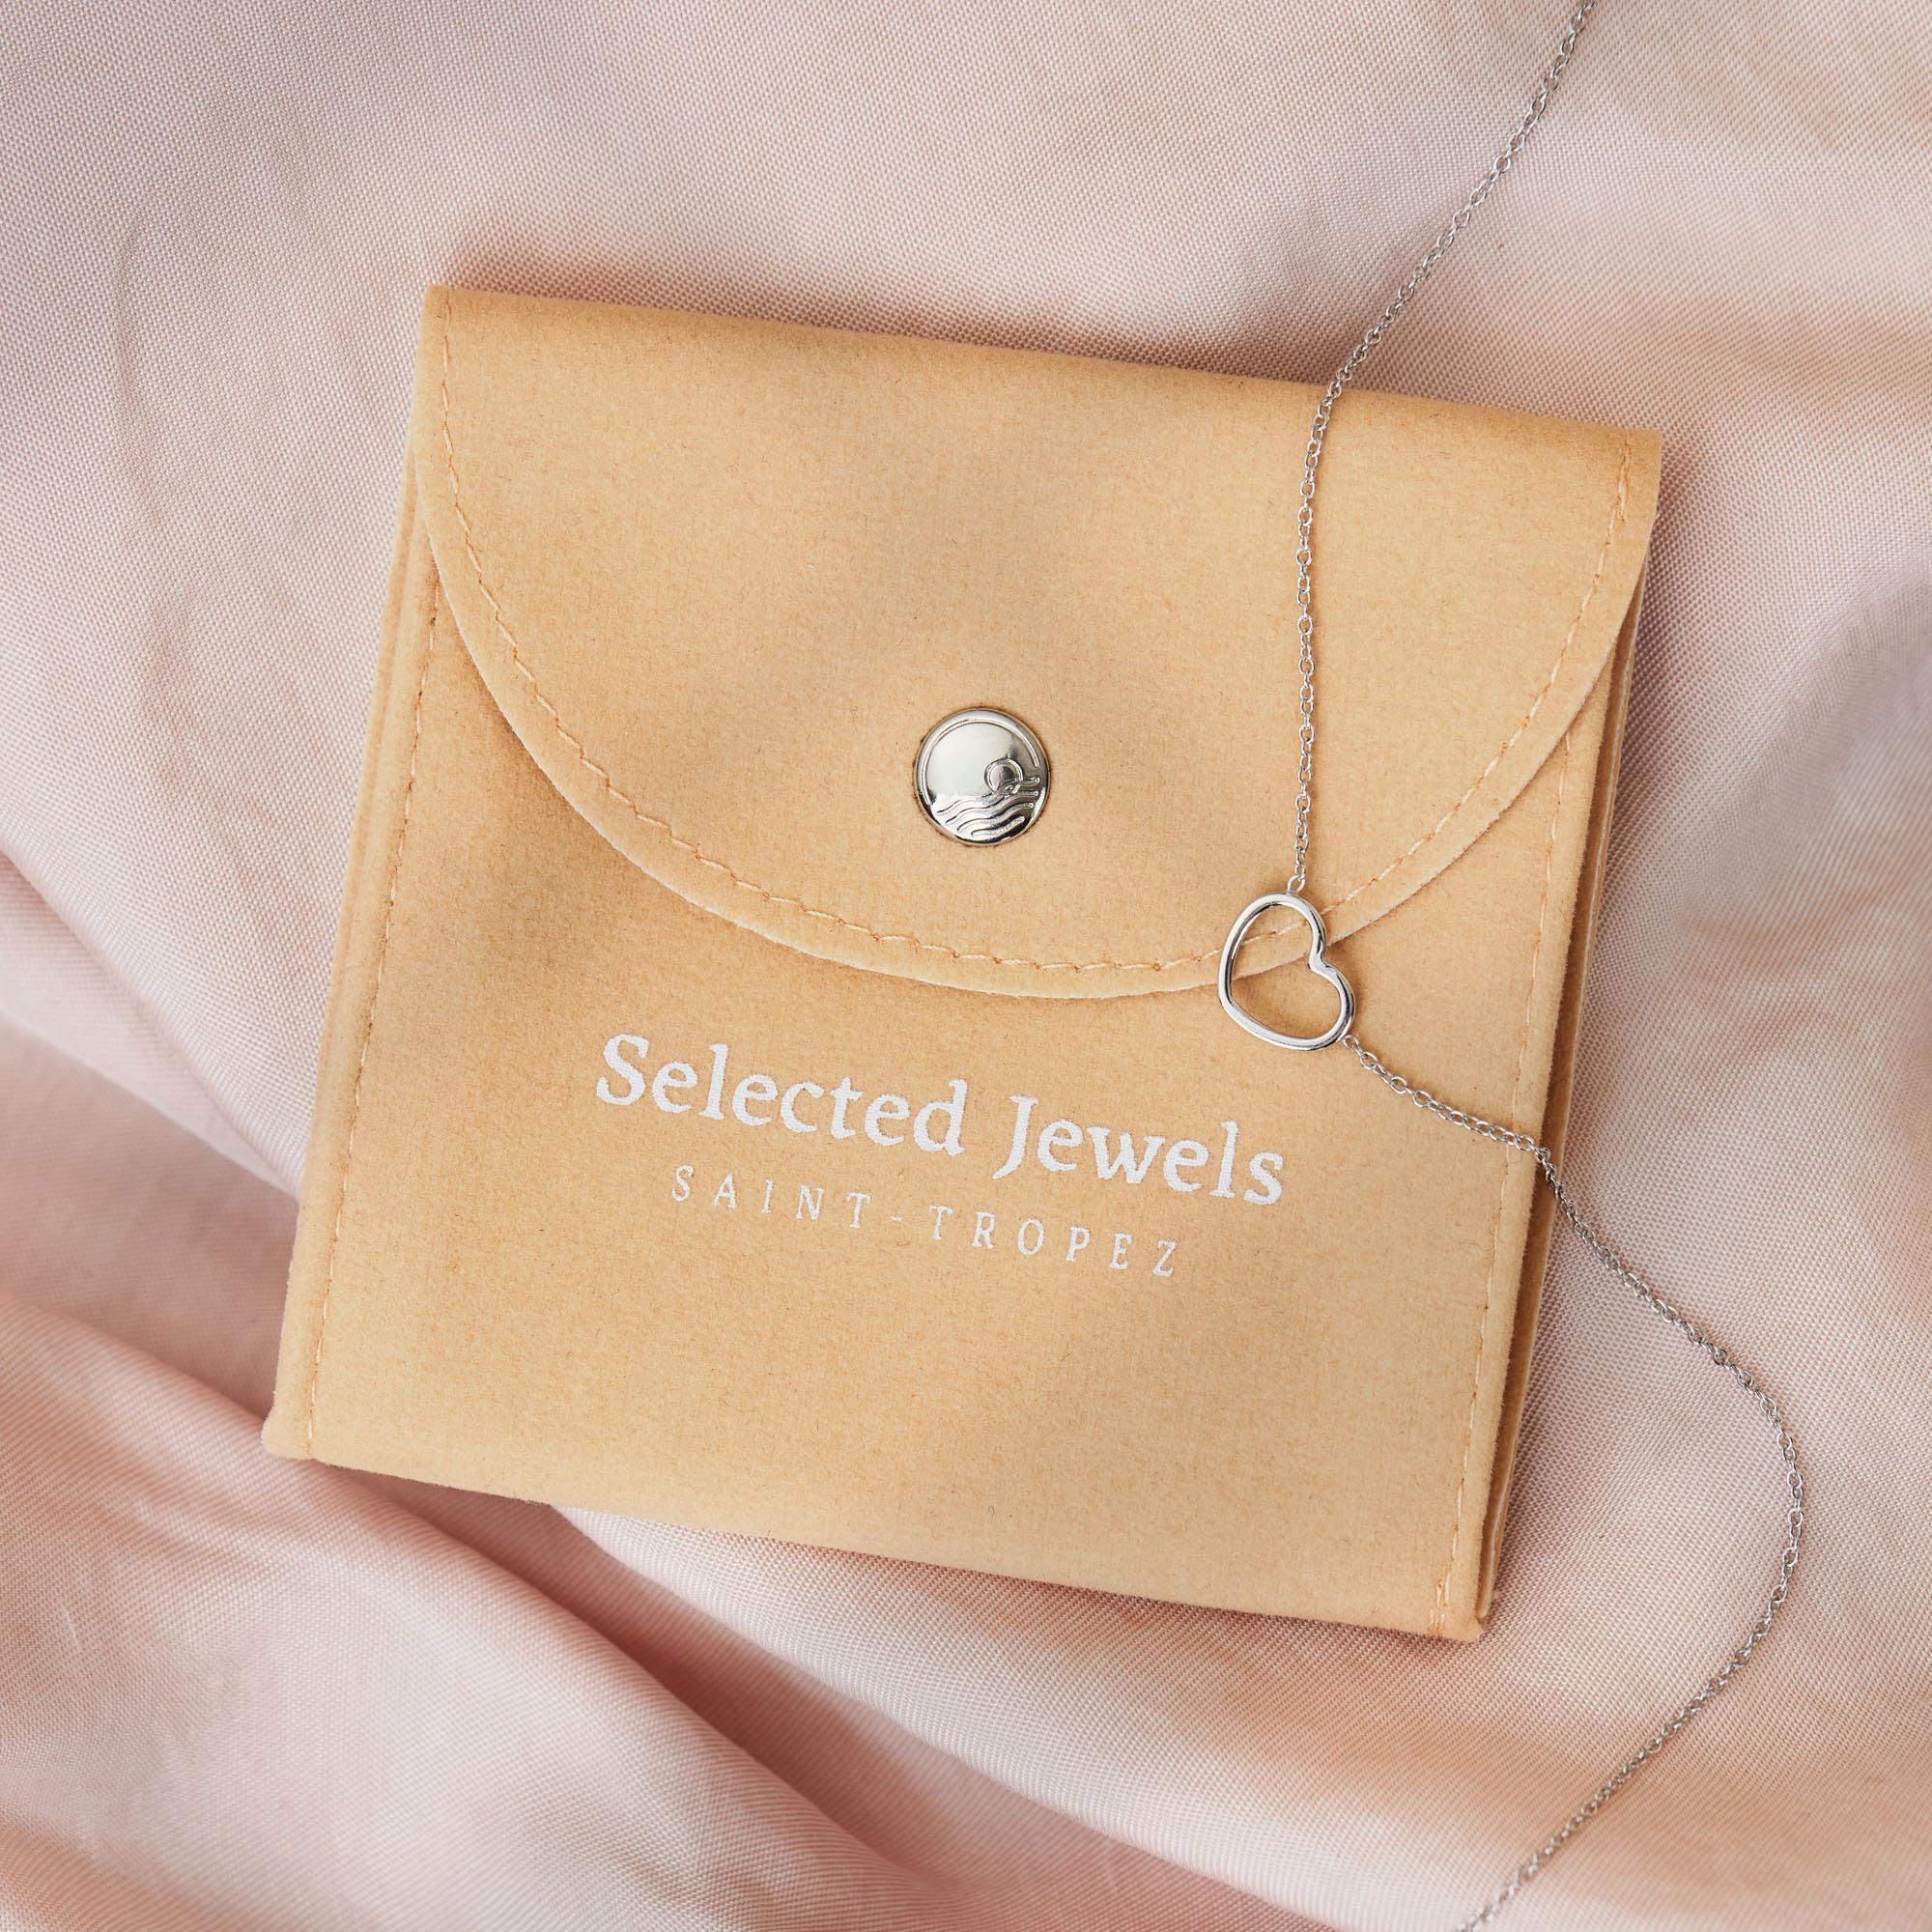 Selected Jewels Emma Jolie collier couleur or en argent sterling 925